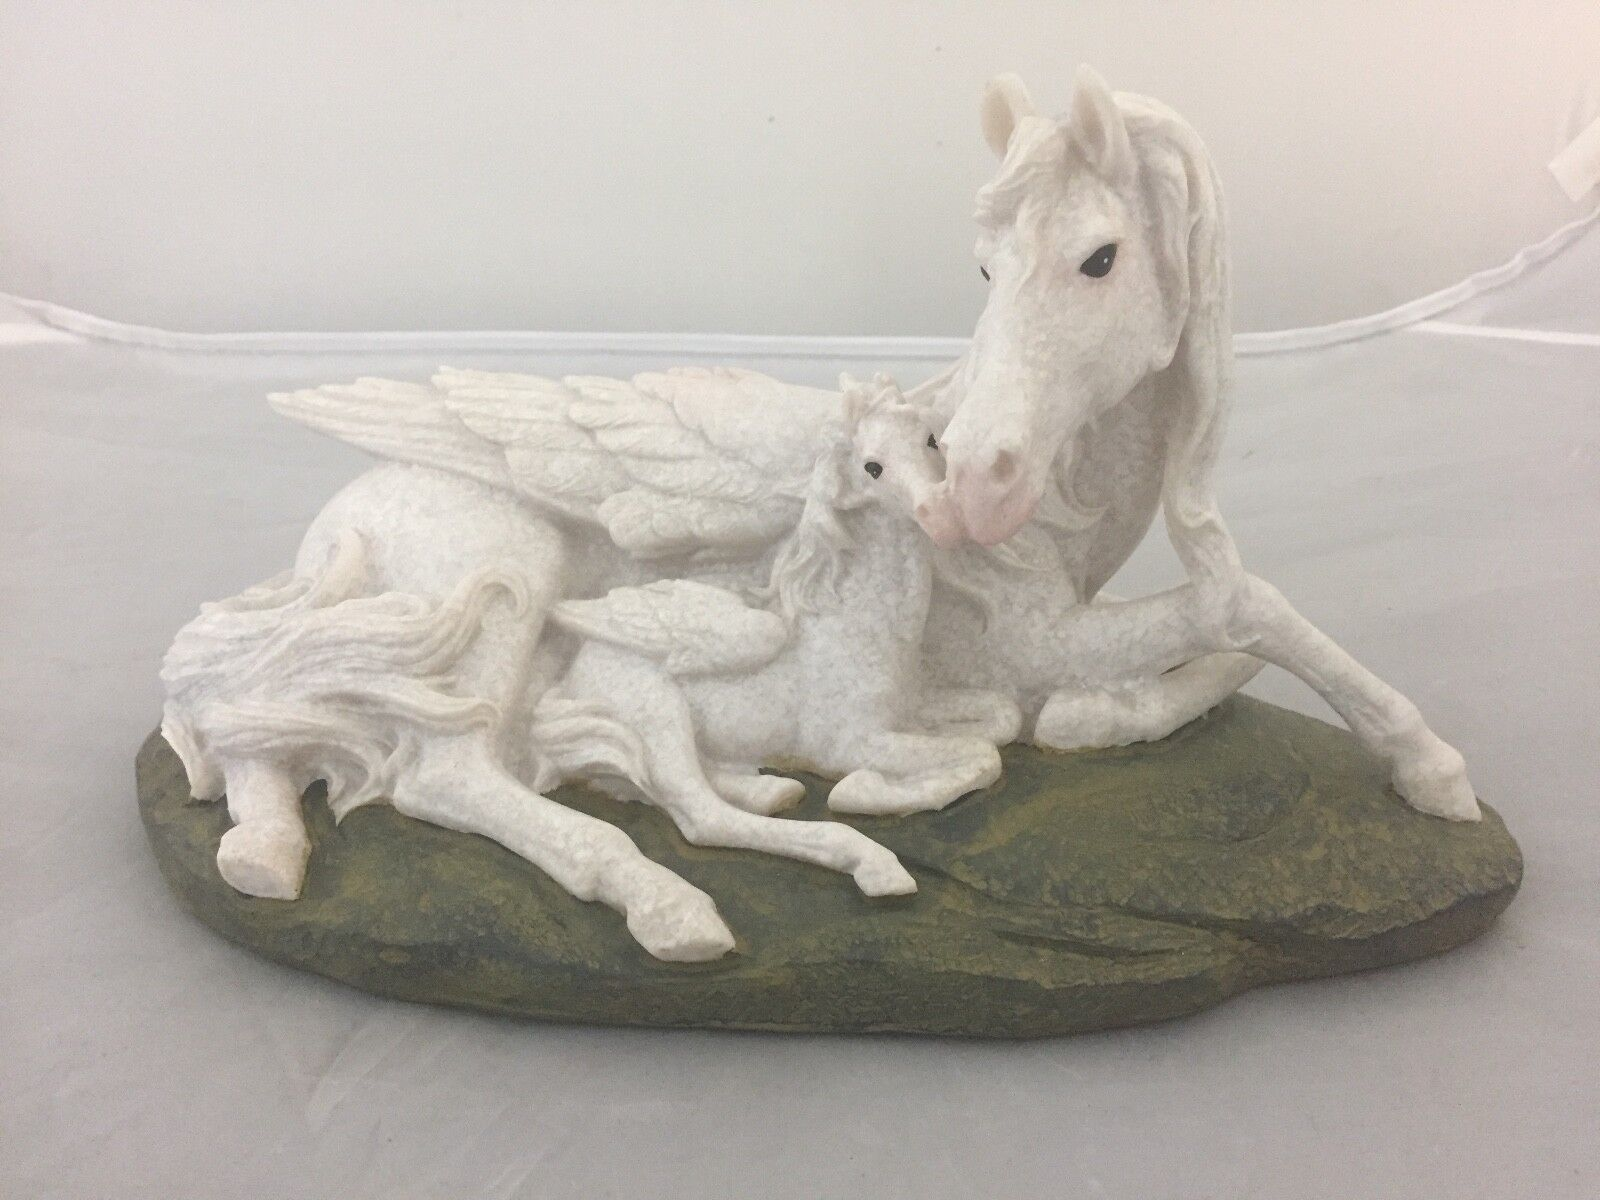 Nuevo Bebé encantado legado Pegasus Caballo Figura De Resina mítico Nemesis Now en Caja